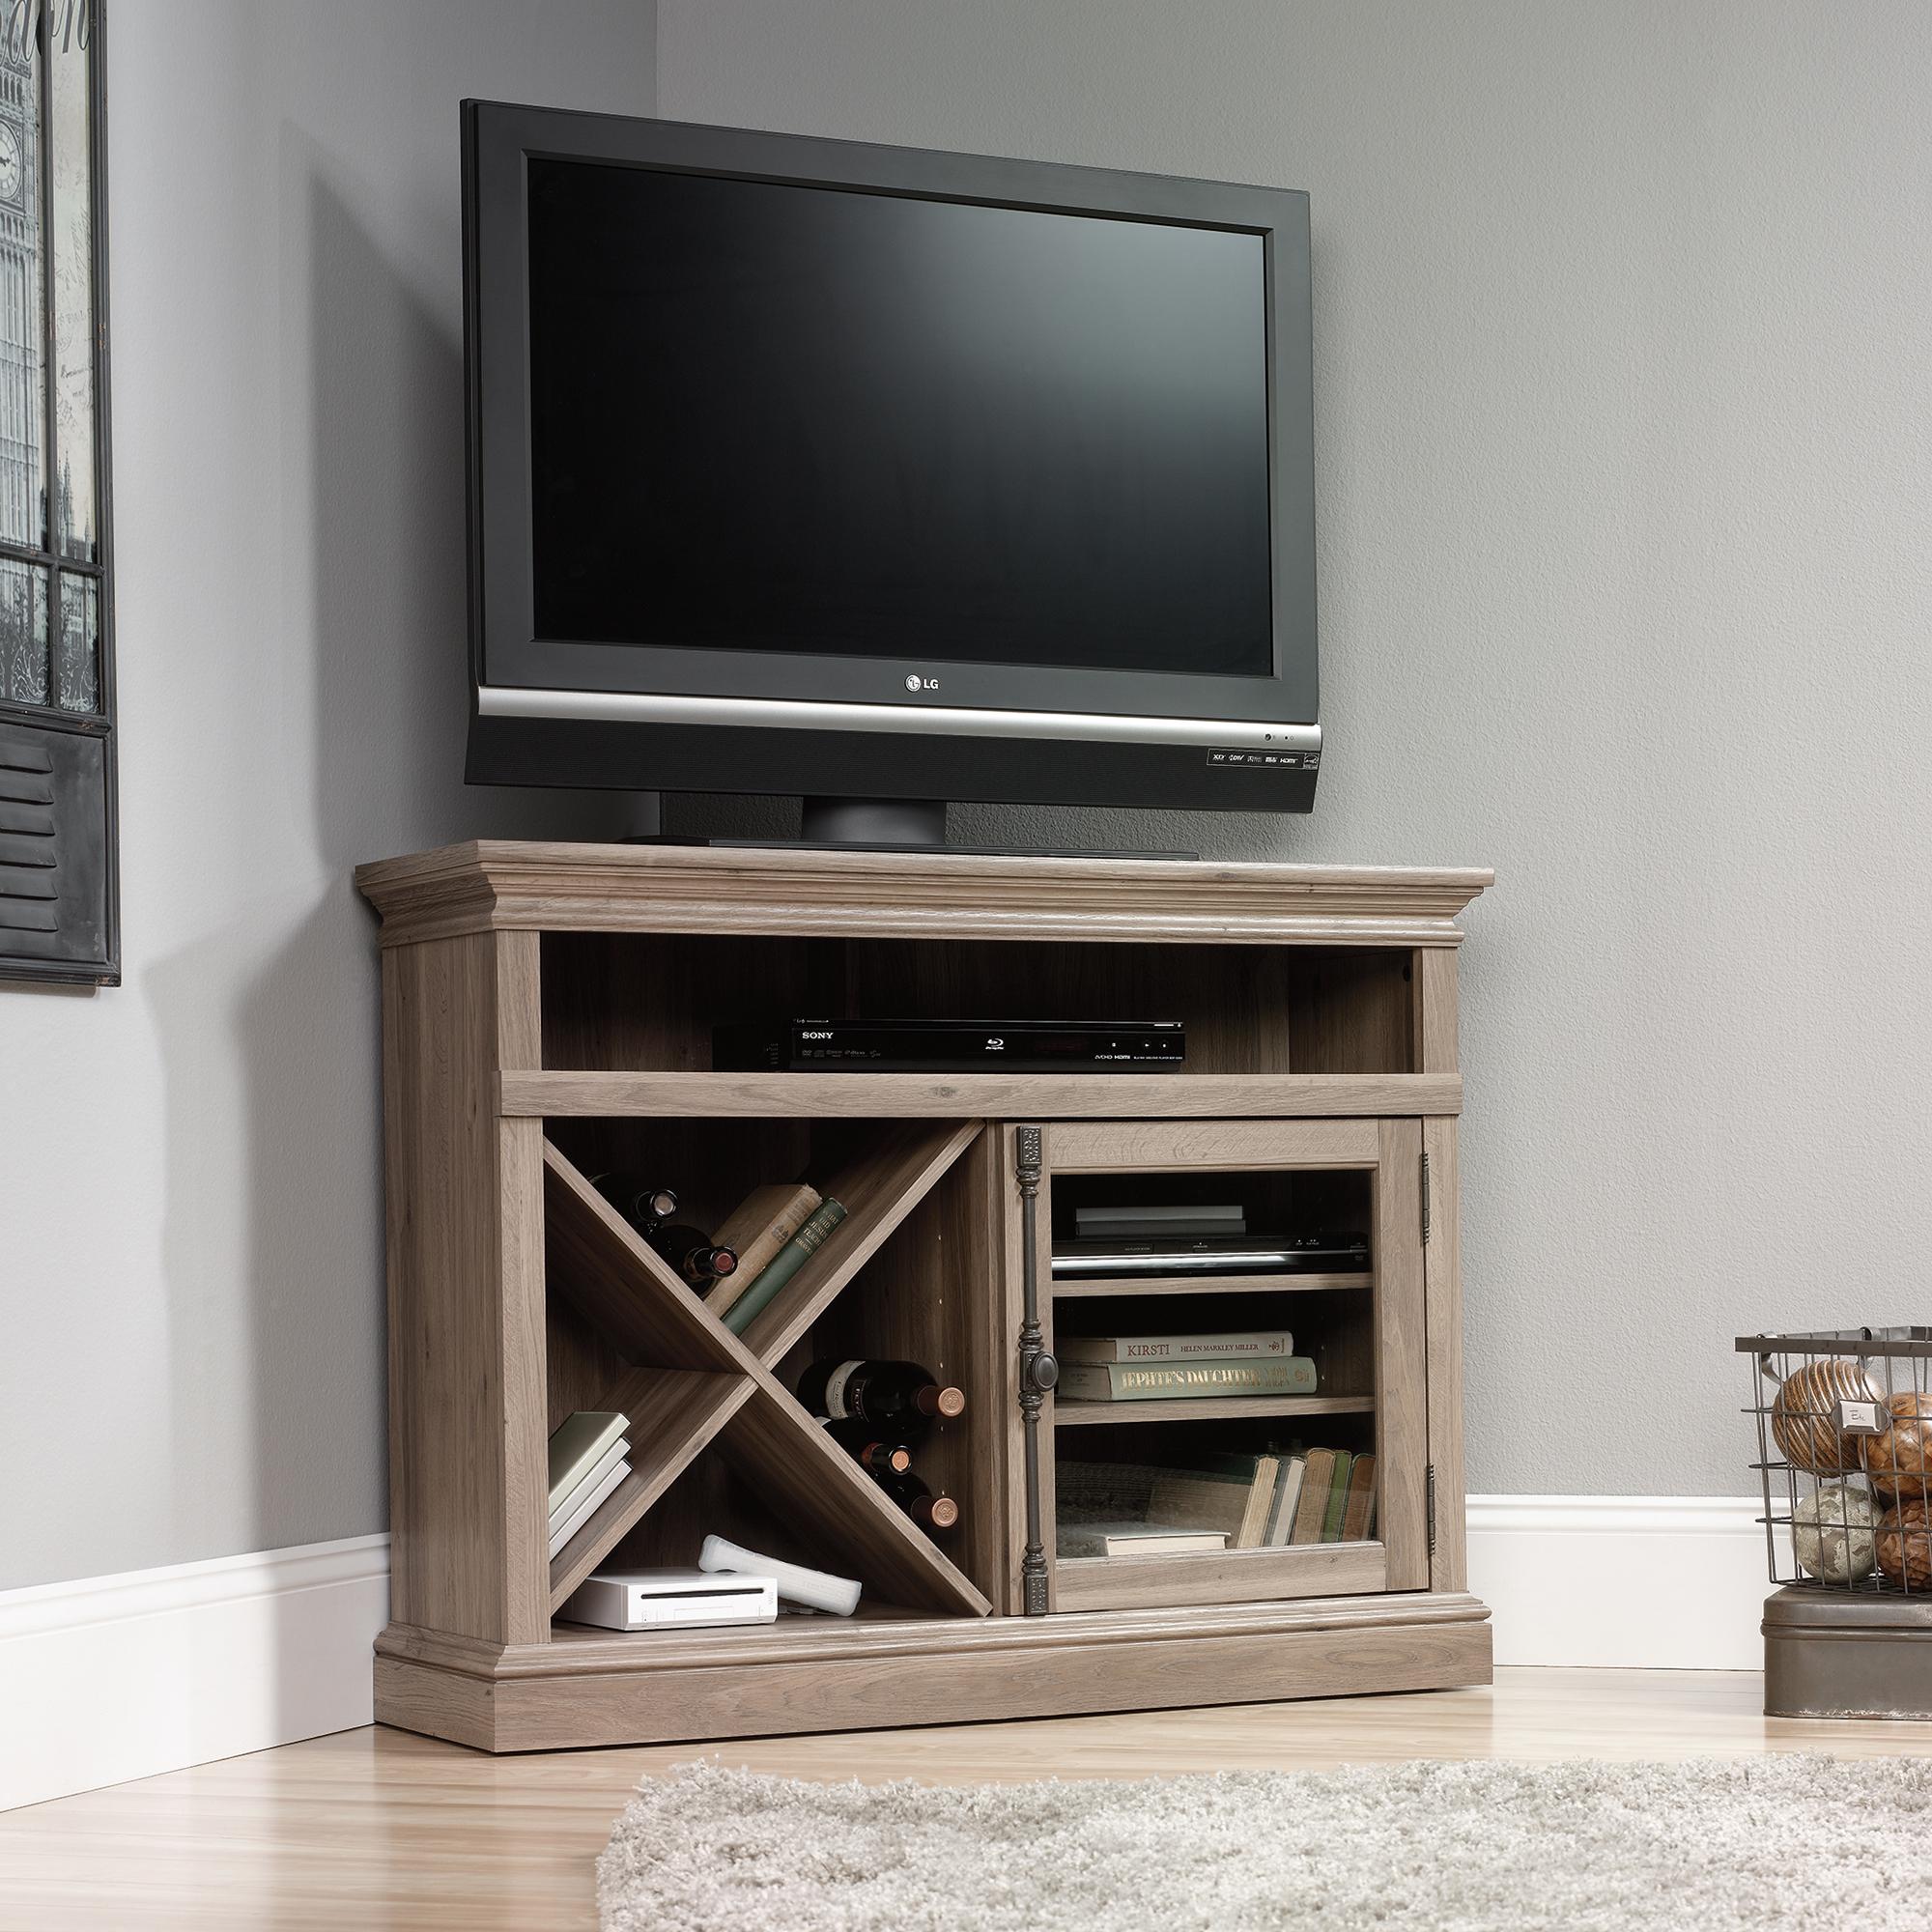 sauder corner tv stand - Tv Entertainment Stands